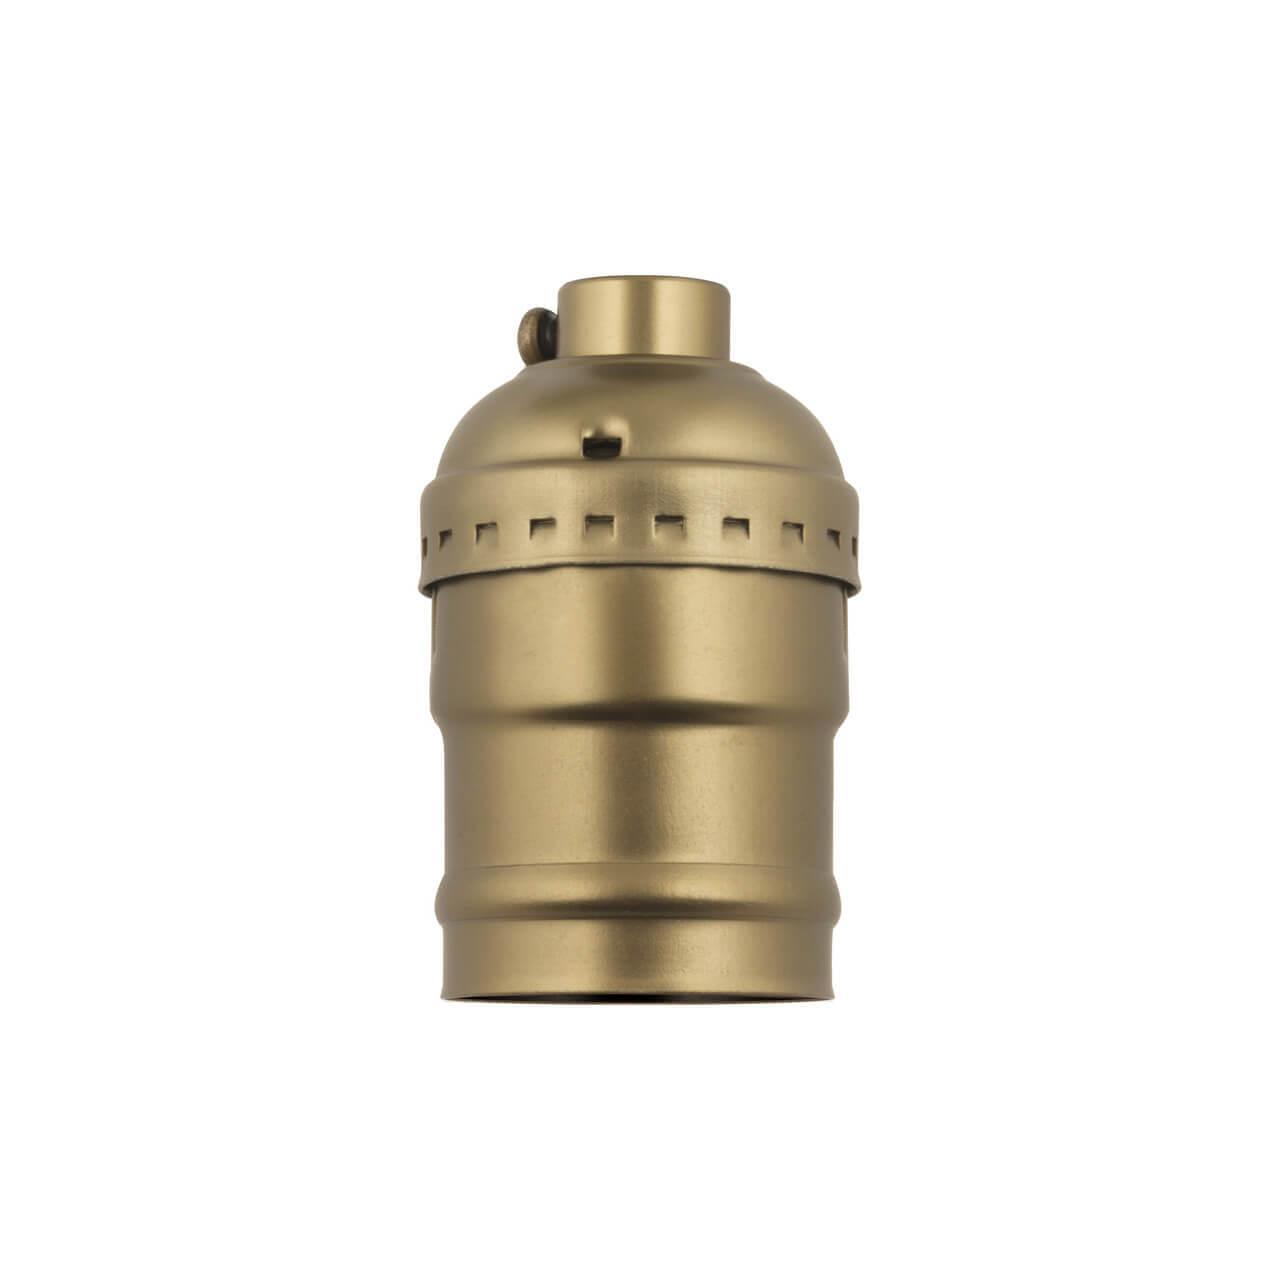 Патрон (UL-00000531) Uniel DLC-V-H01/E27 BRONZE патрон uniel ulh e27p ceramic